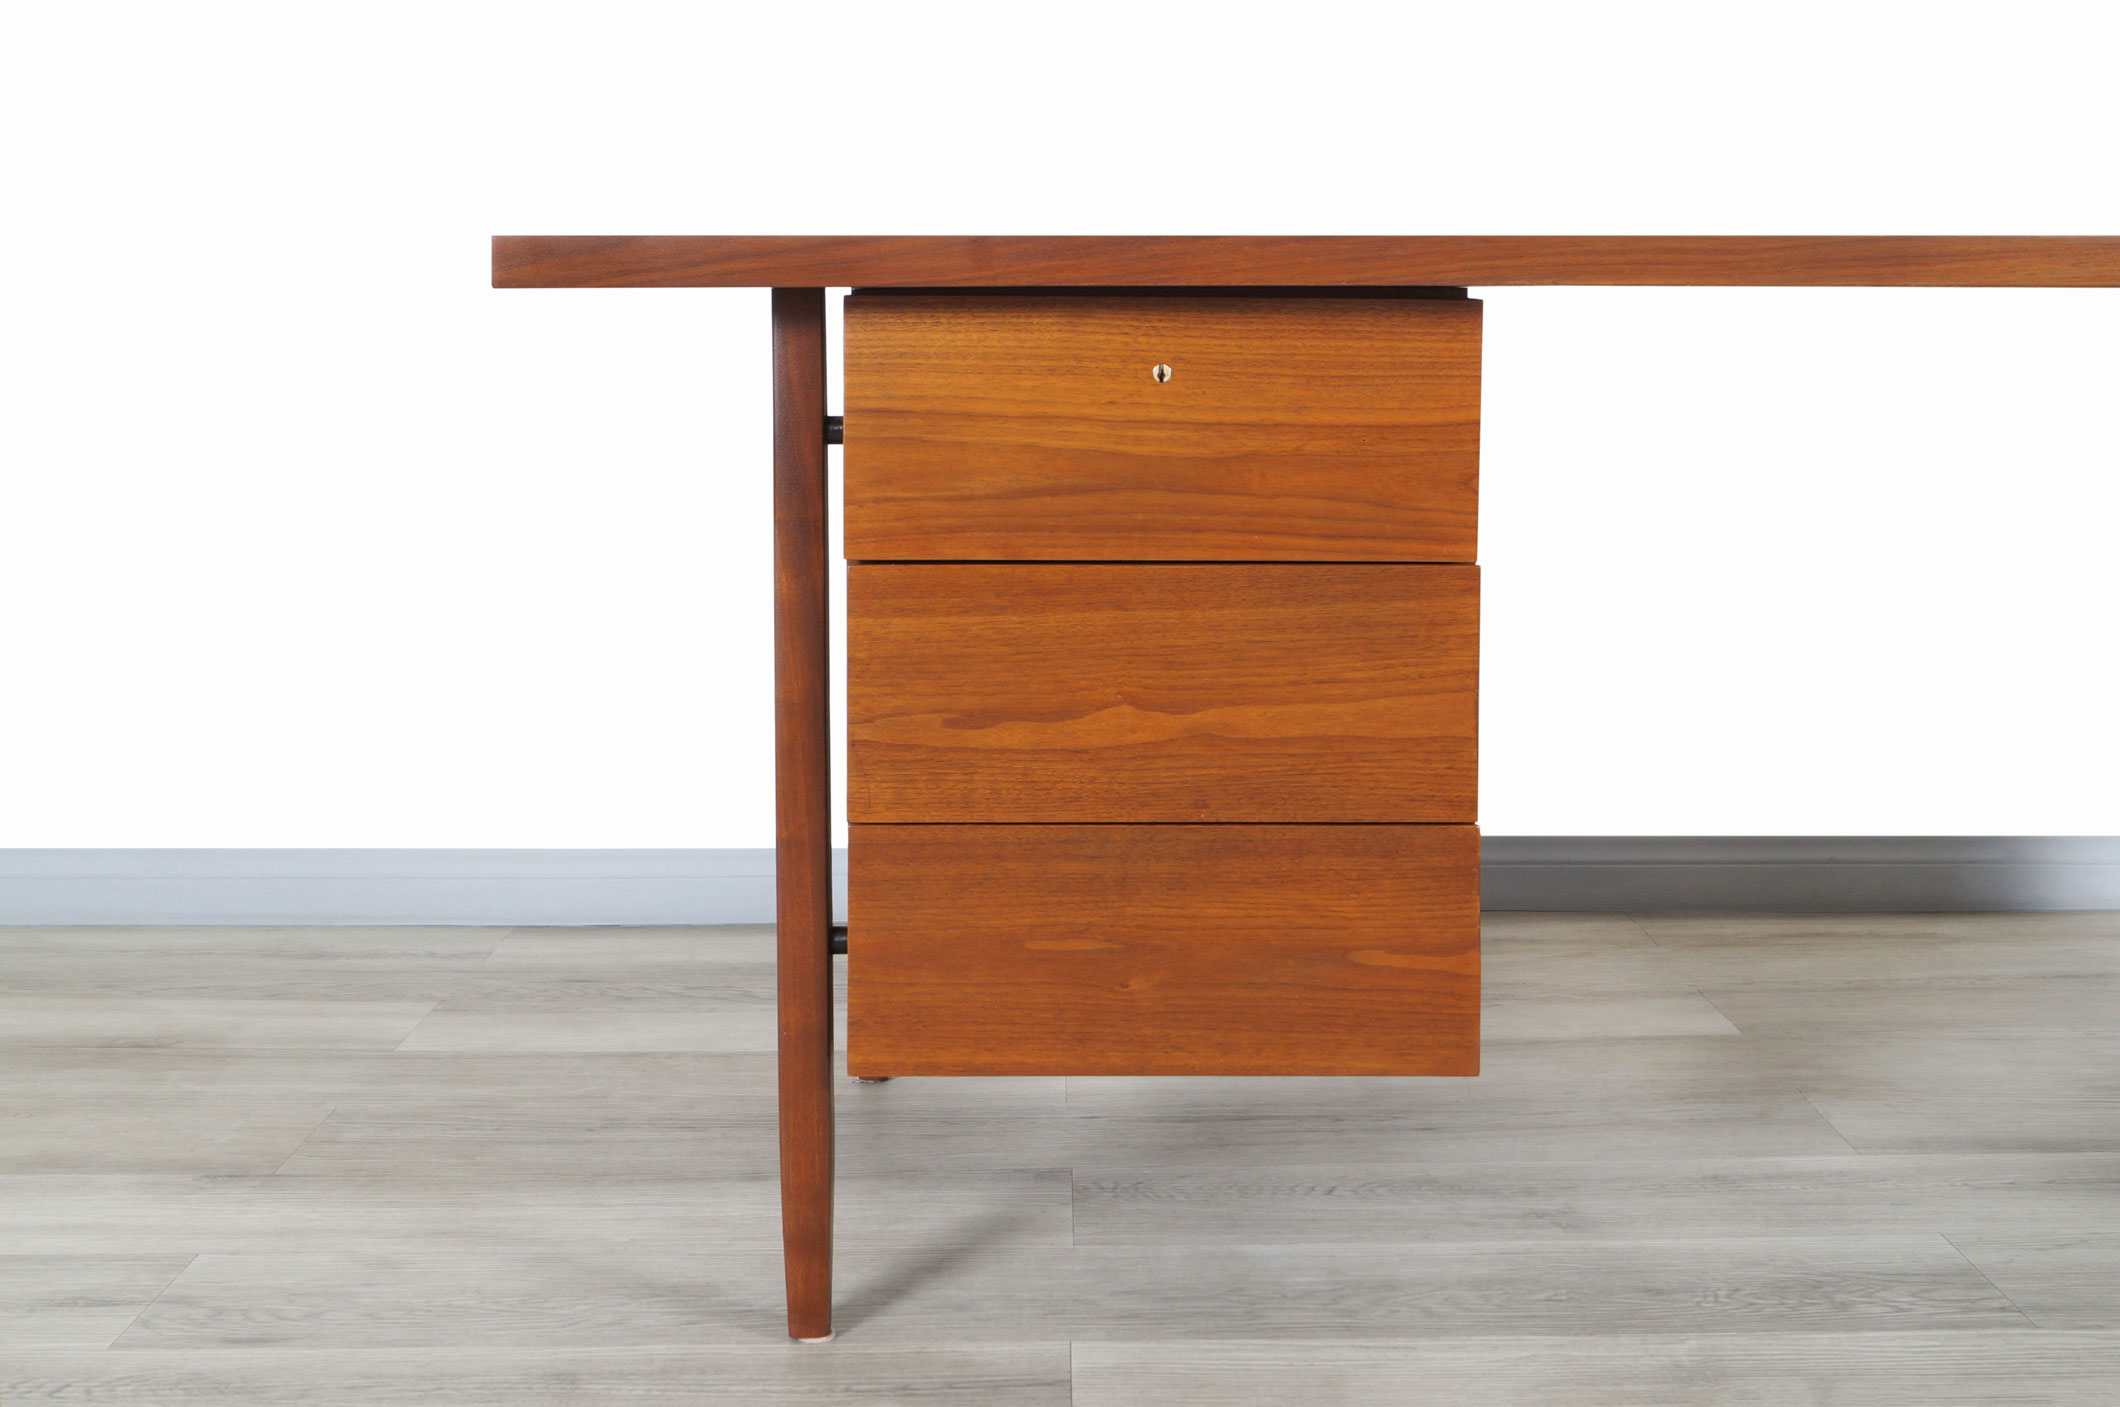 Vintage Walnut Model-1503 Executive Desk by Florence Knoll